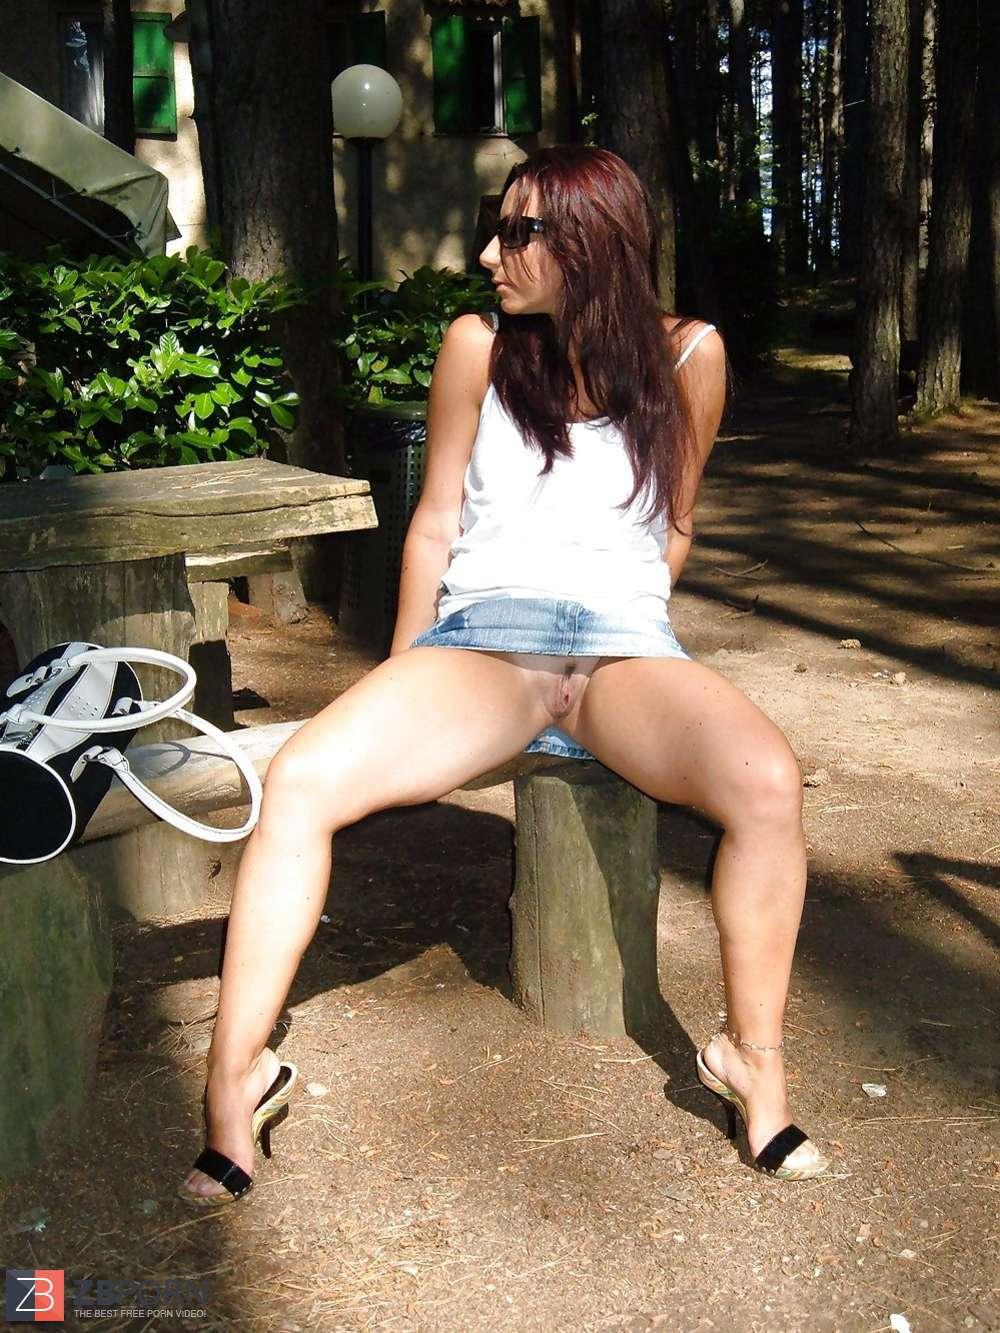 Fermin recommend Chinese midget stripper